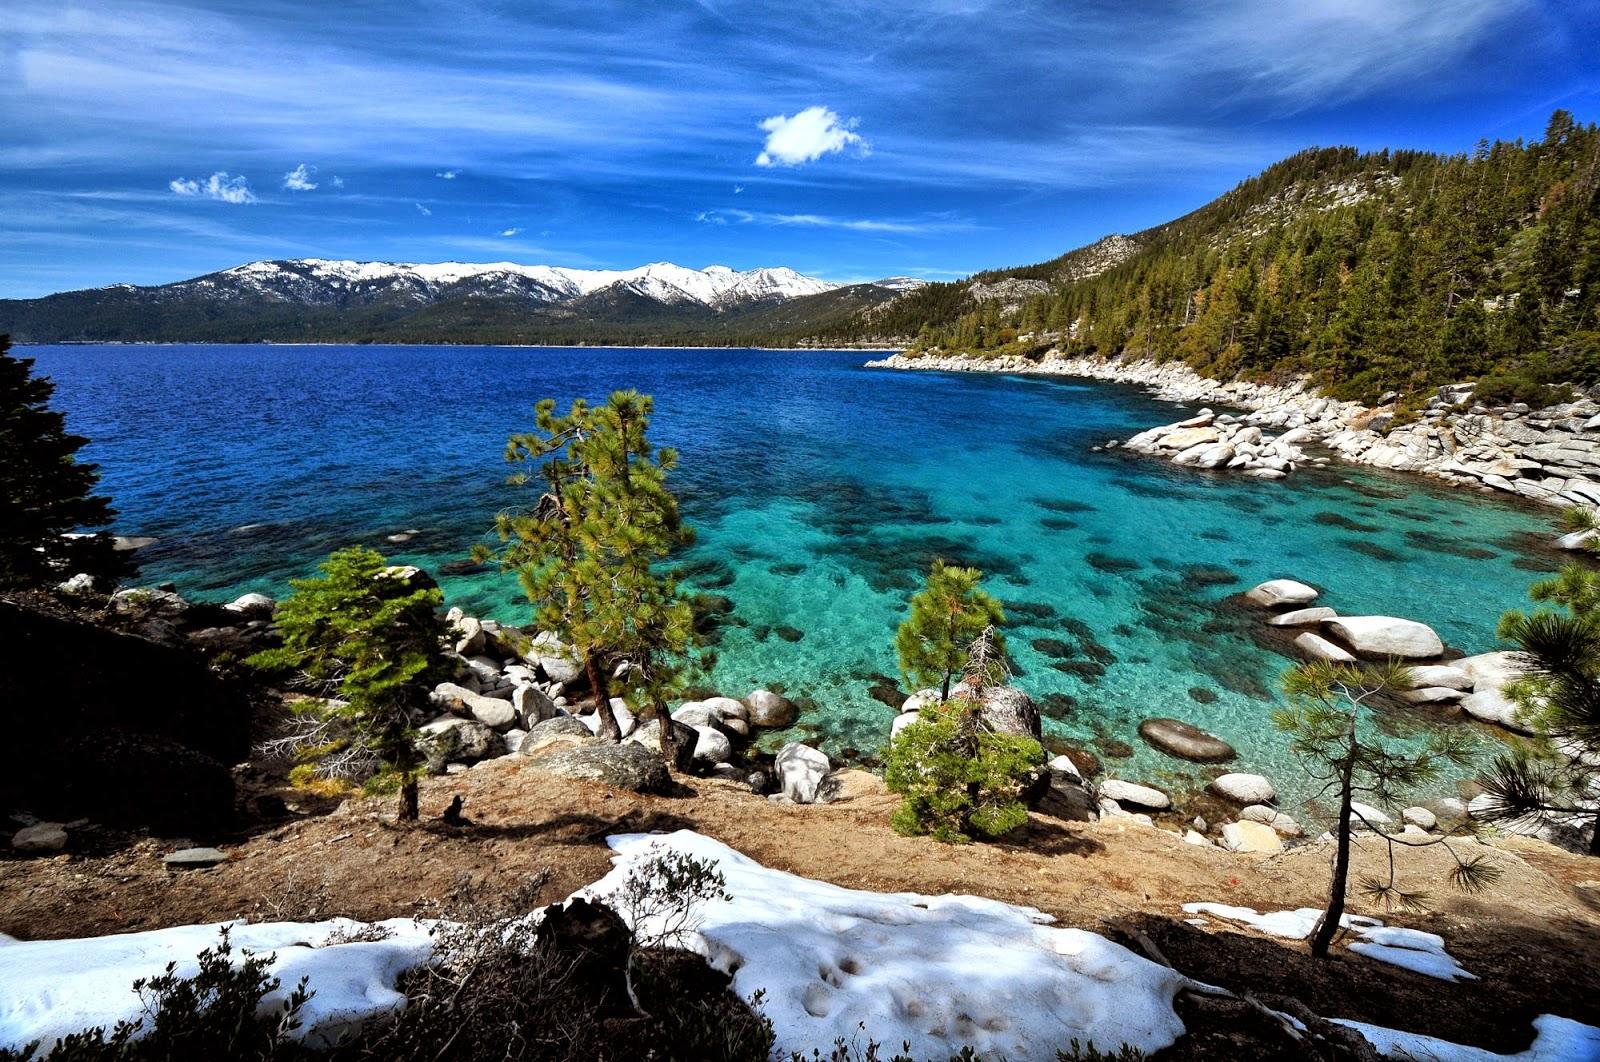 South Lake Tahoe Wallpaper